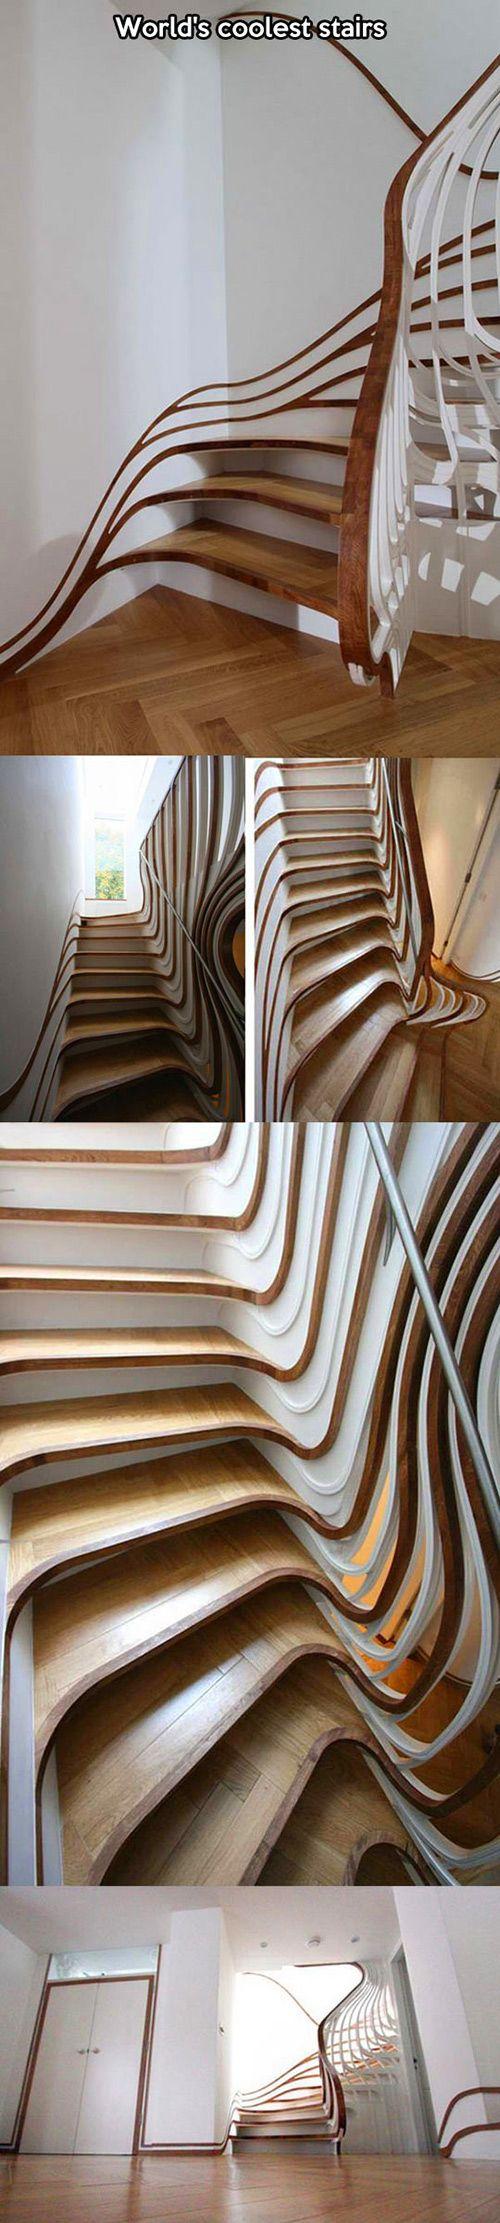 If Tim Burton Designed Stairs.